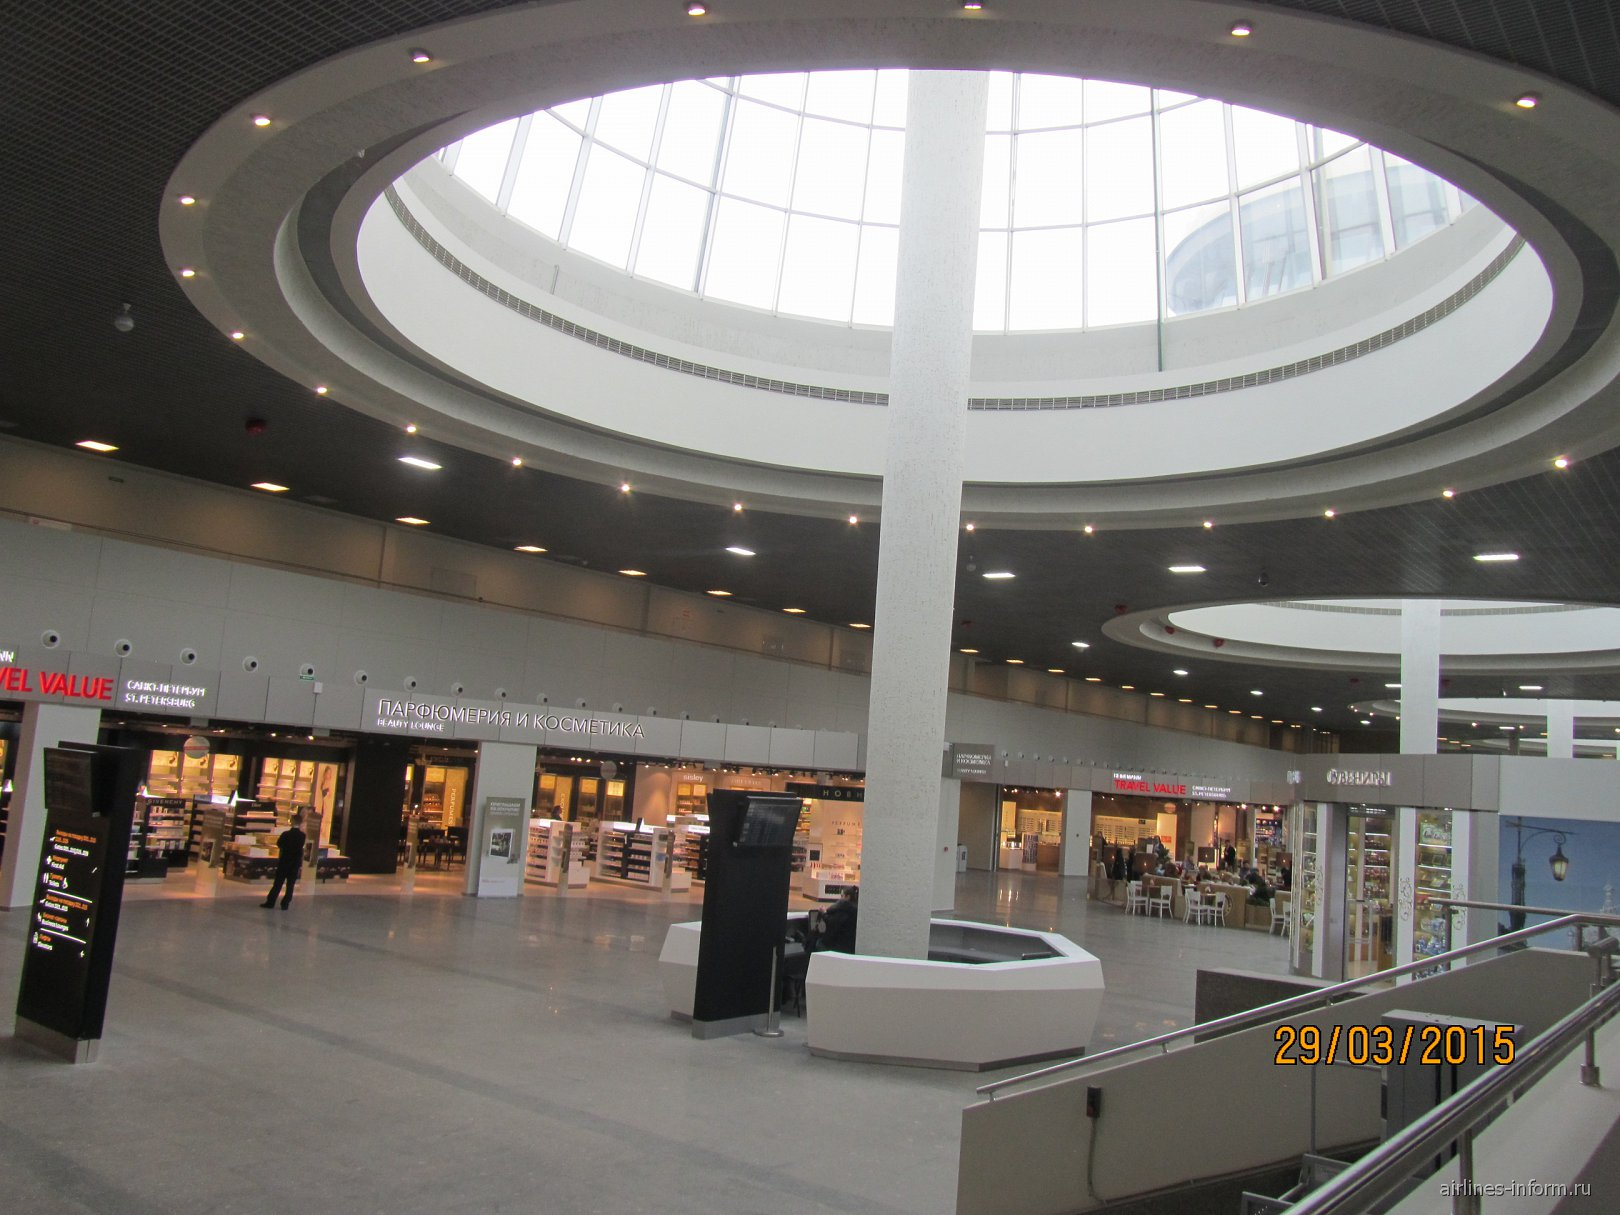 Магазины в аэропорту Санкт-Петербург Пулково